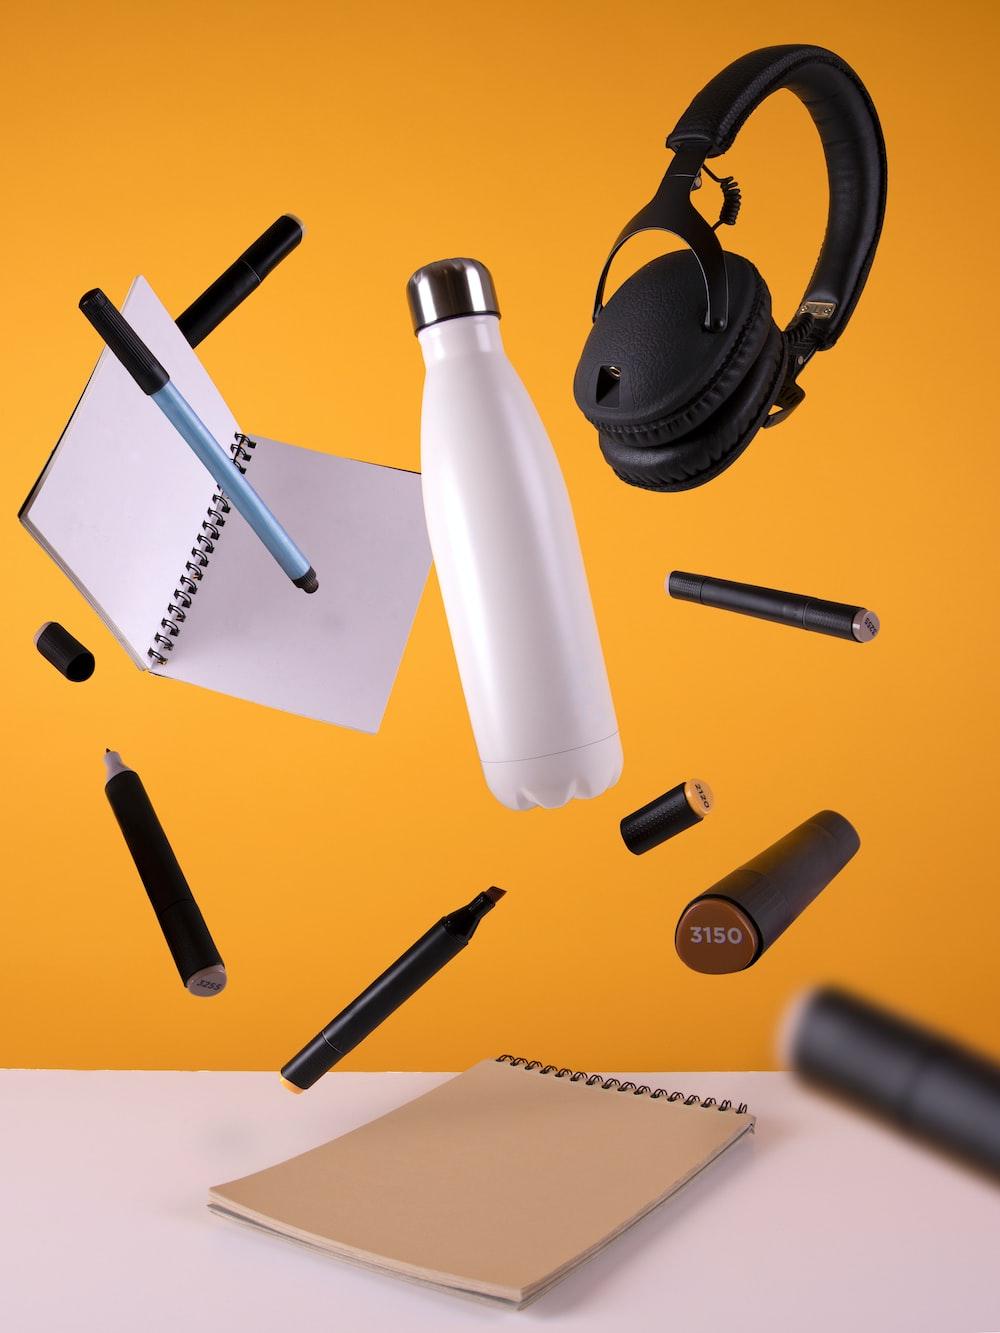 black cordless headphones beside sport bottle and notebook